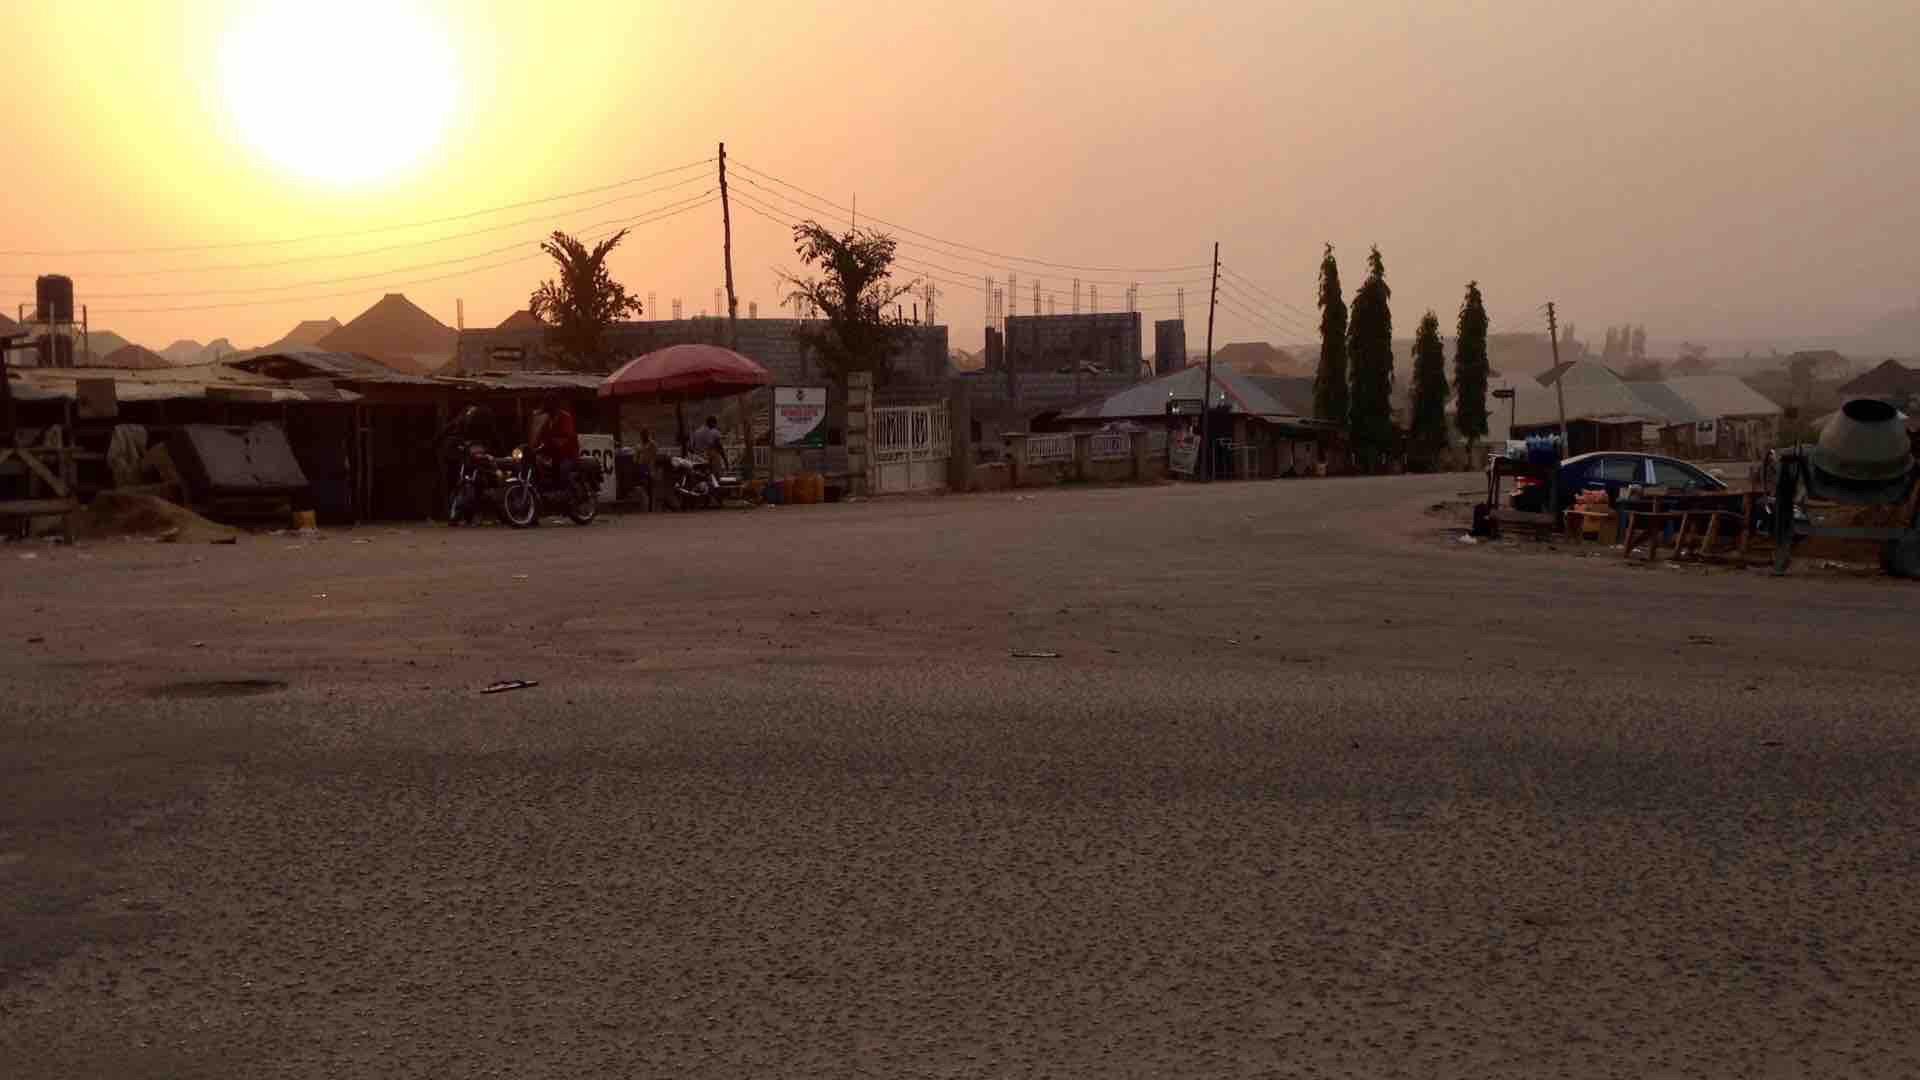 Sunrise over Ushafa Village, FCT, Abuja, Nigeria. #JujuFilms